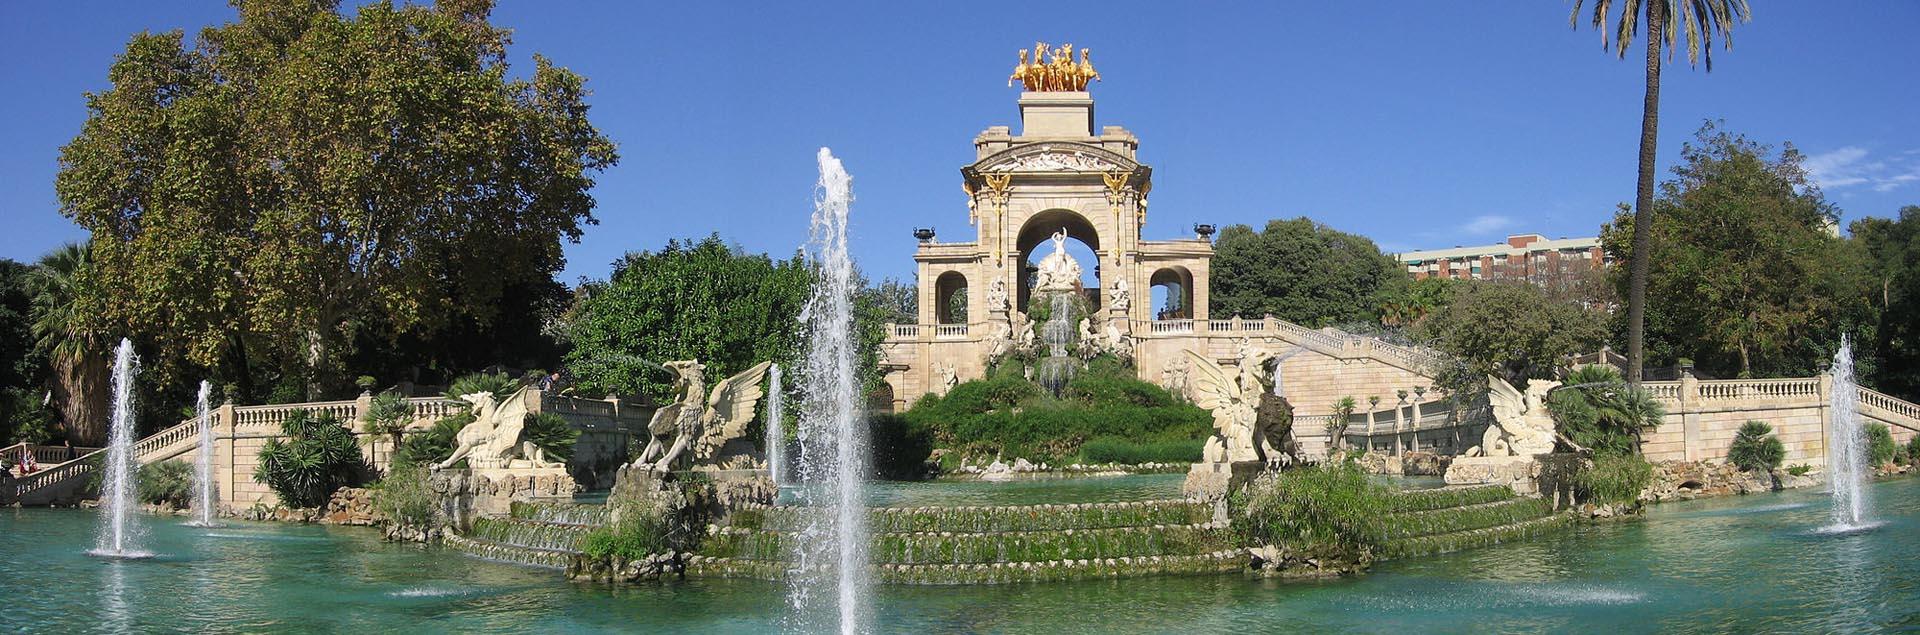 Cascada Monumental, el primer aporte de Gaudí a la arquitectura catalana